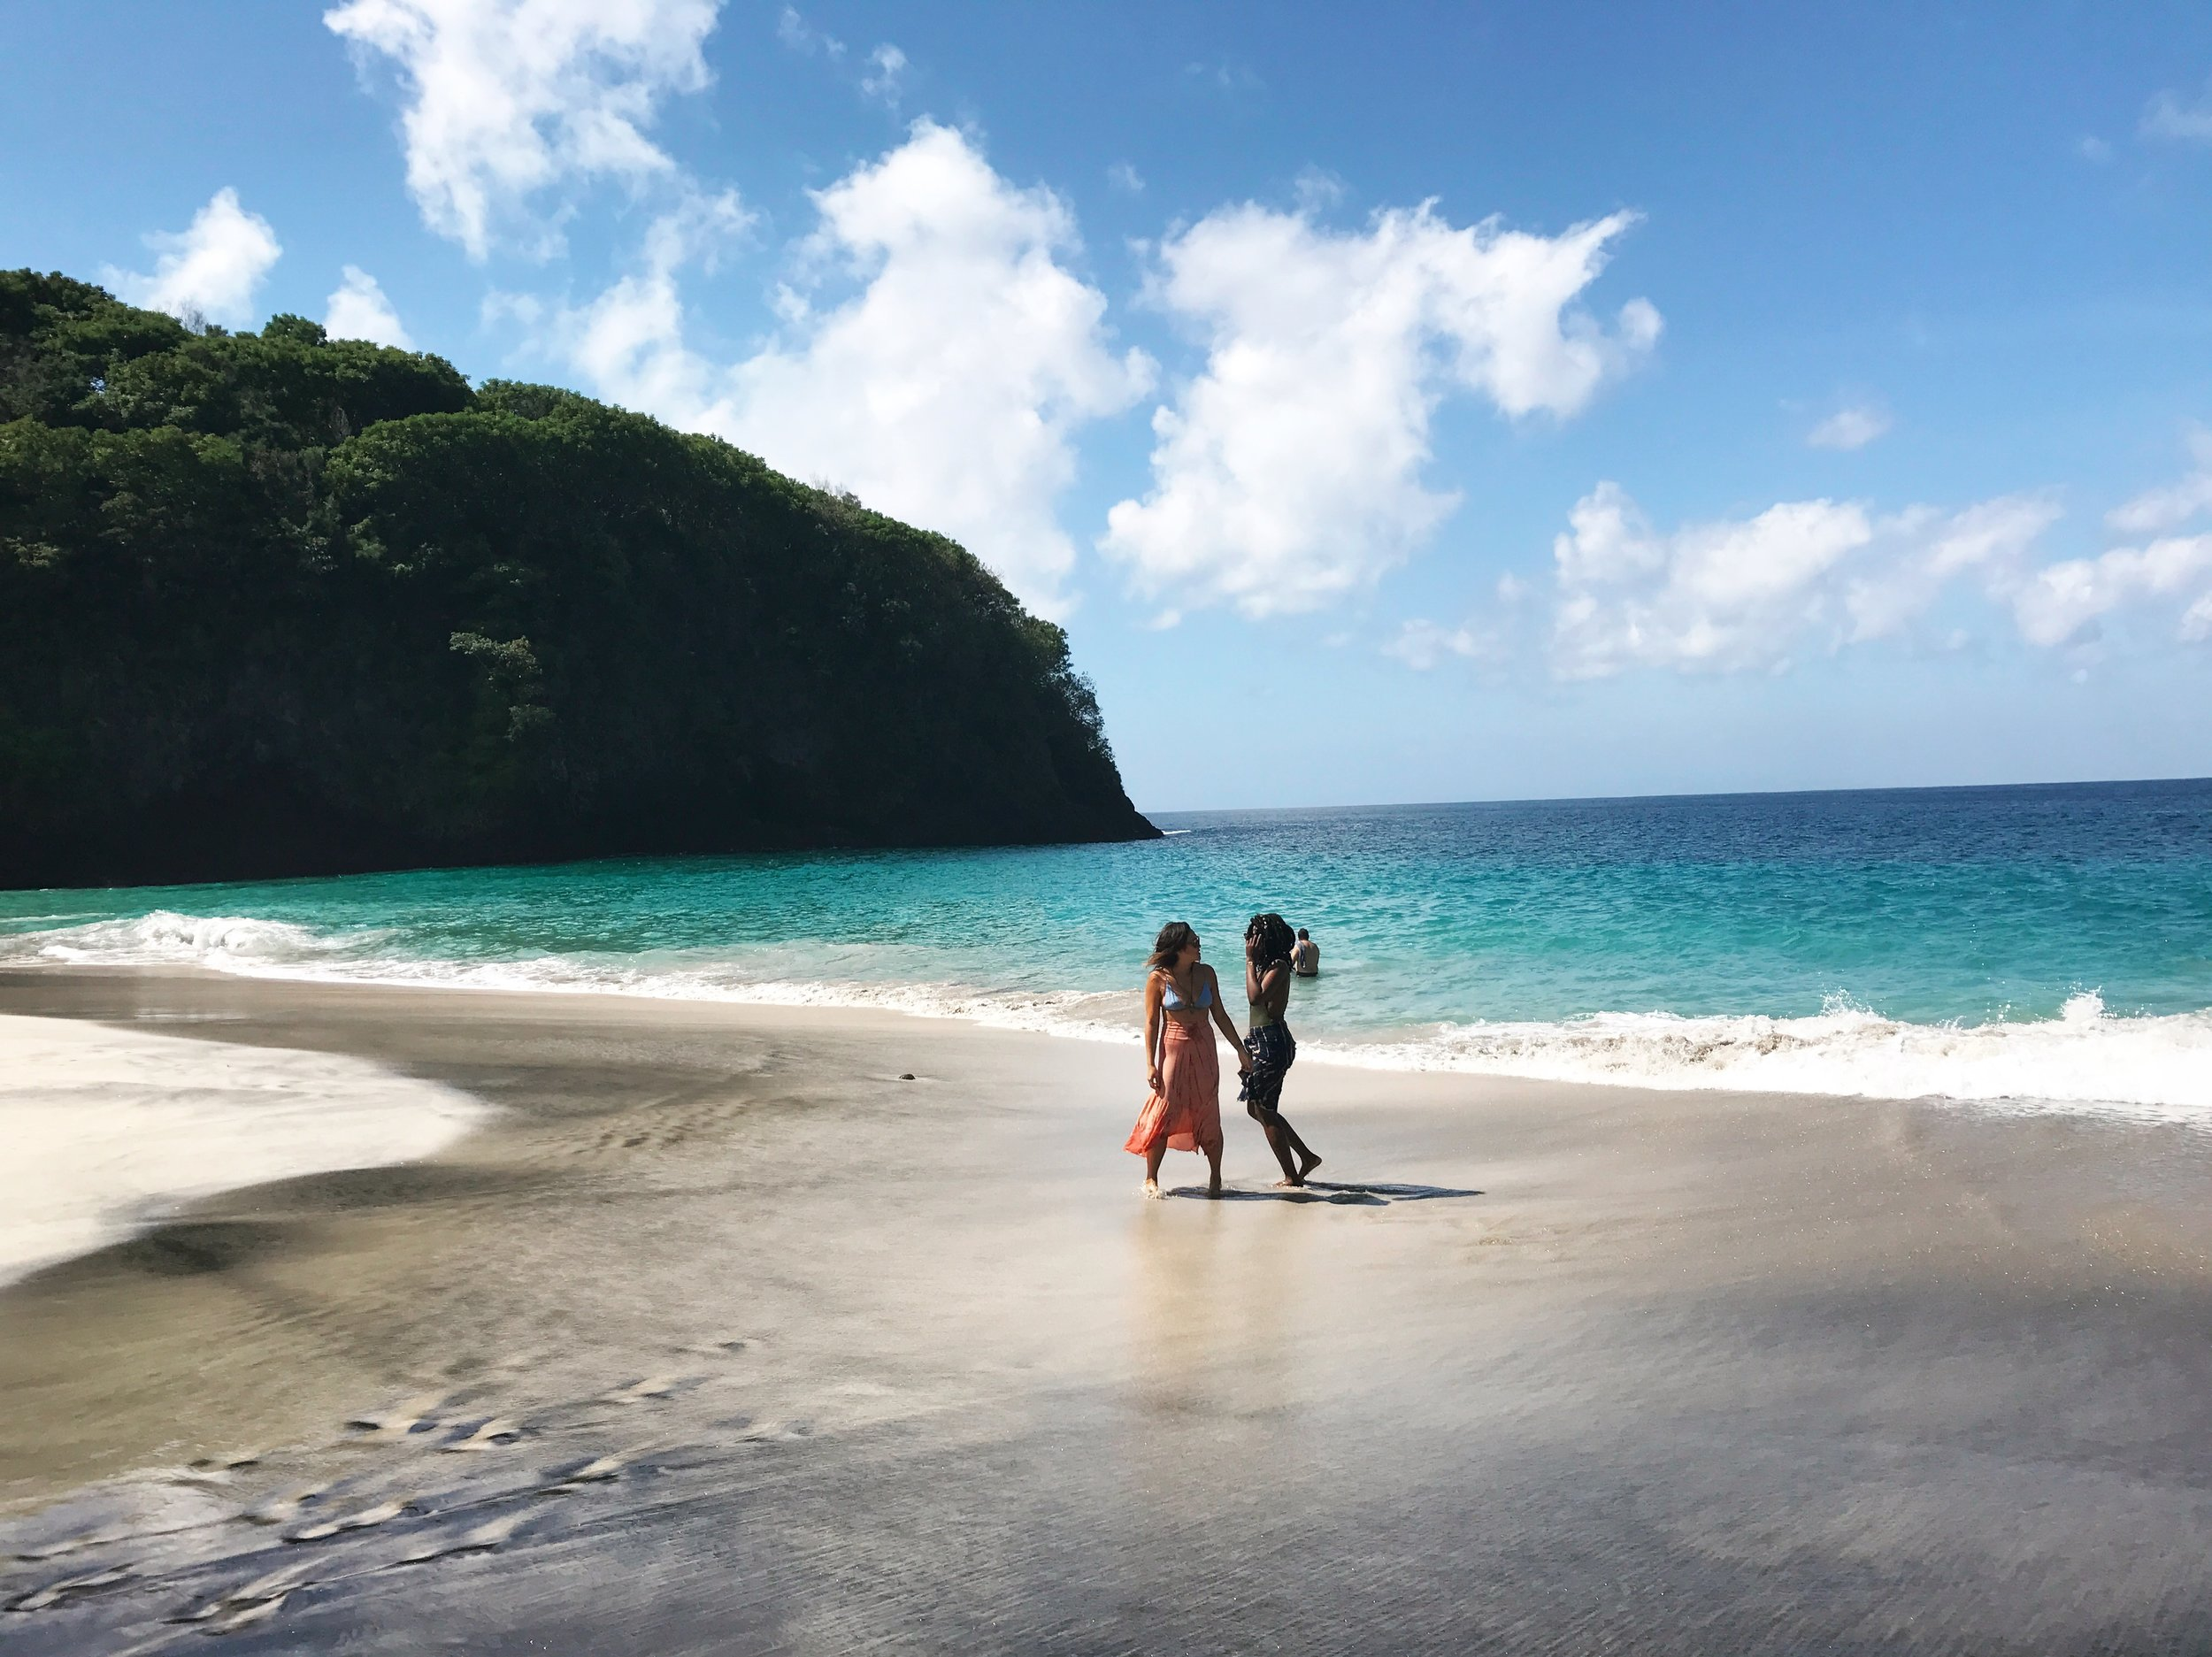 Virgin Beach, Bali, Indonesia